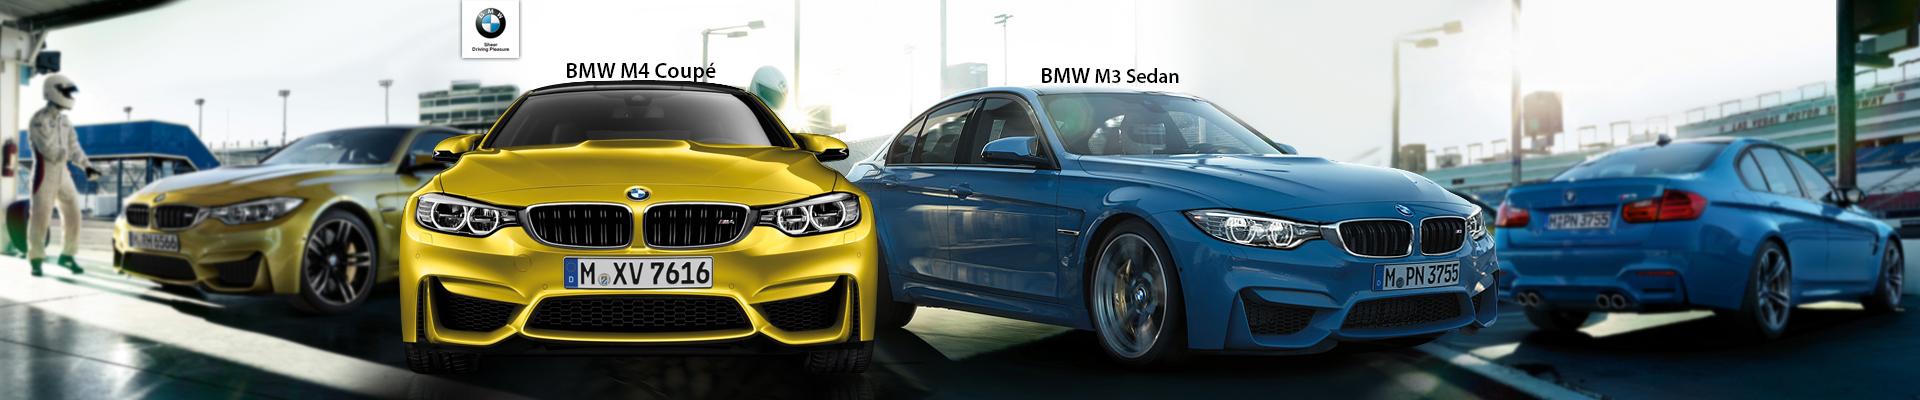 BMW M4 M3